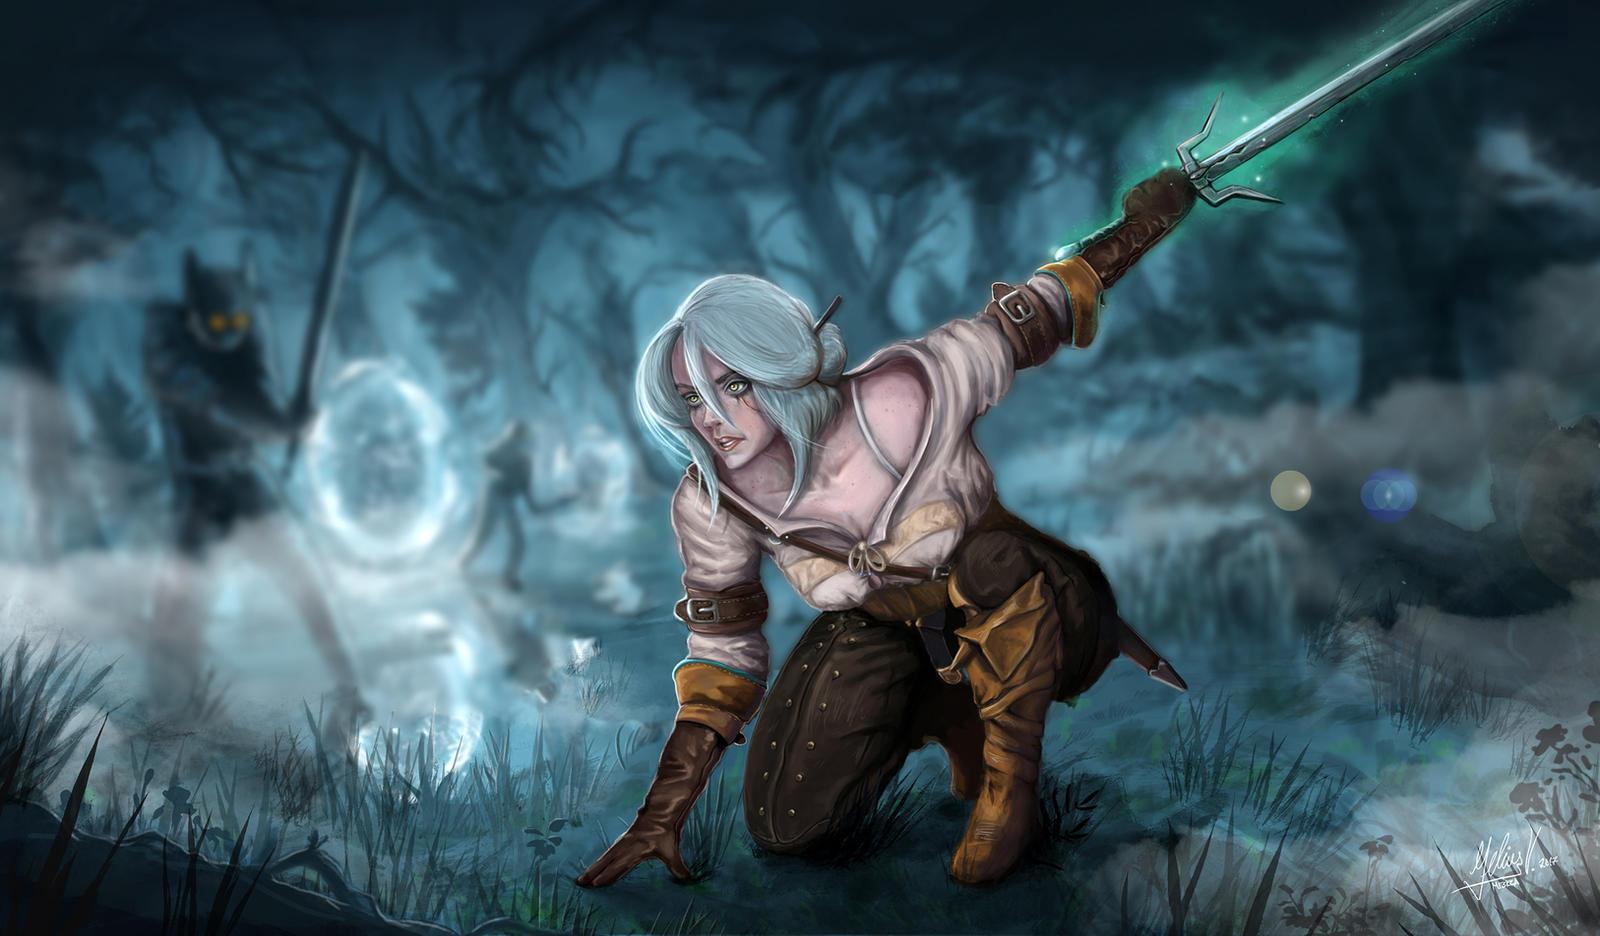 The Witcher 3 Fanart By Mi3kka1S4 On DeviantArt